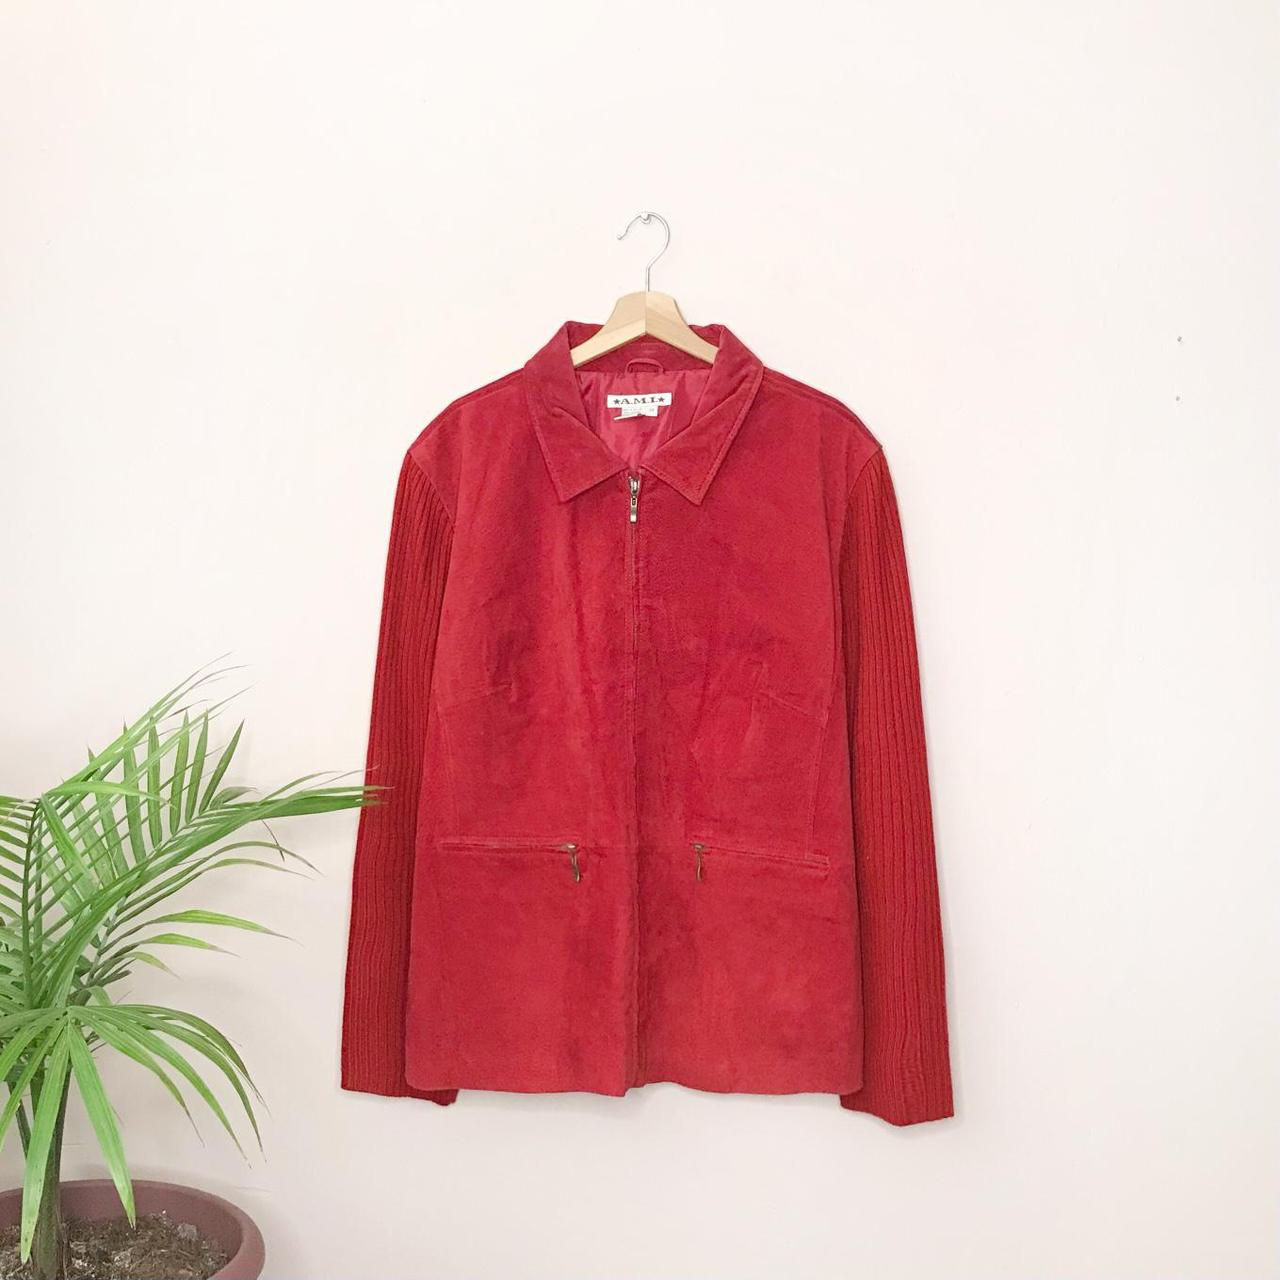 Product Image 1 - Vintage A.M.I. brand suede jacket